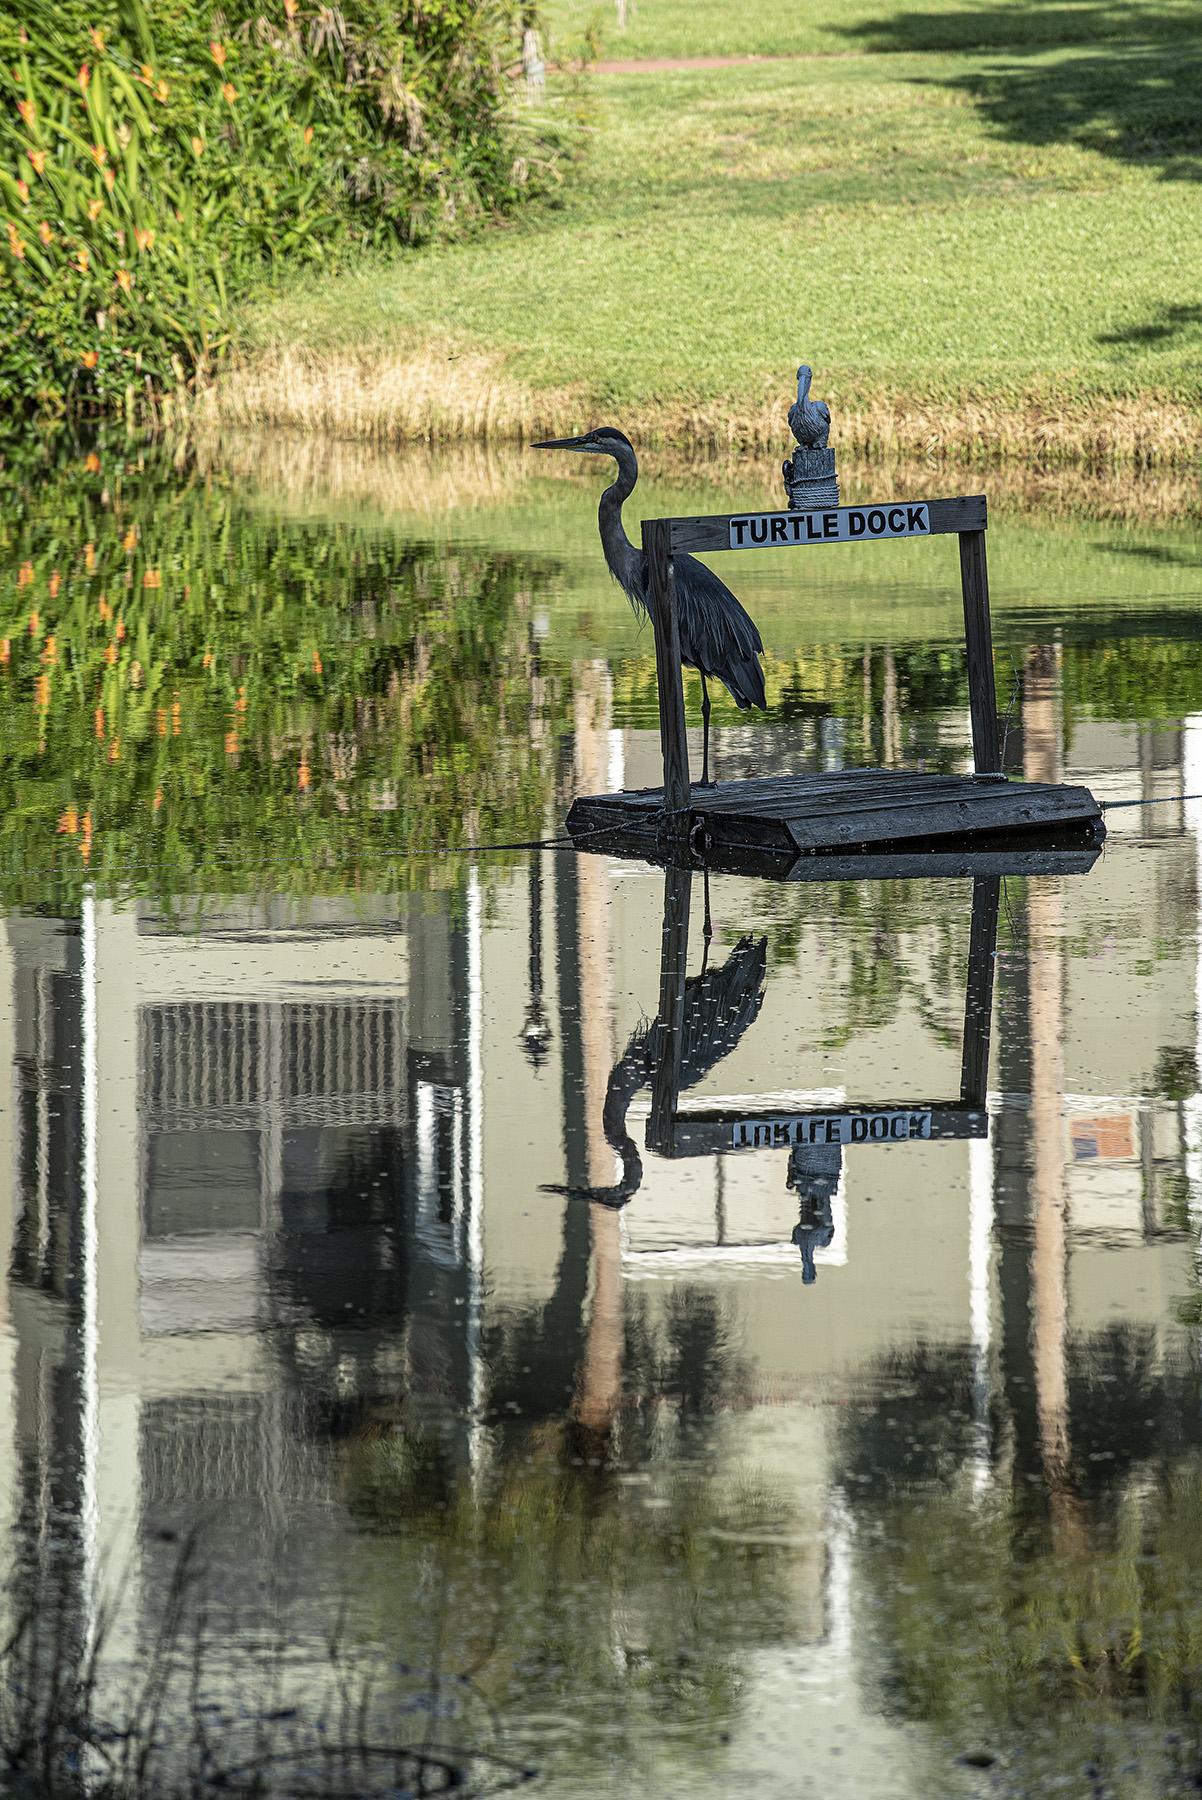 George-on-the-Turtle-Dock